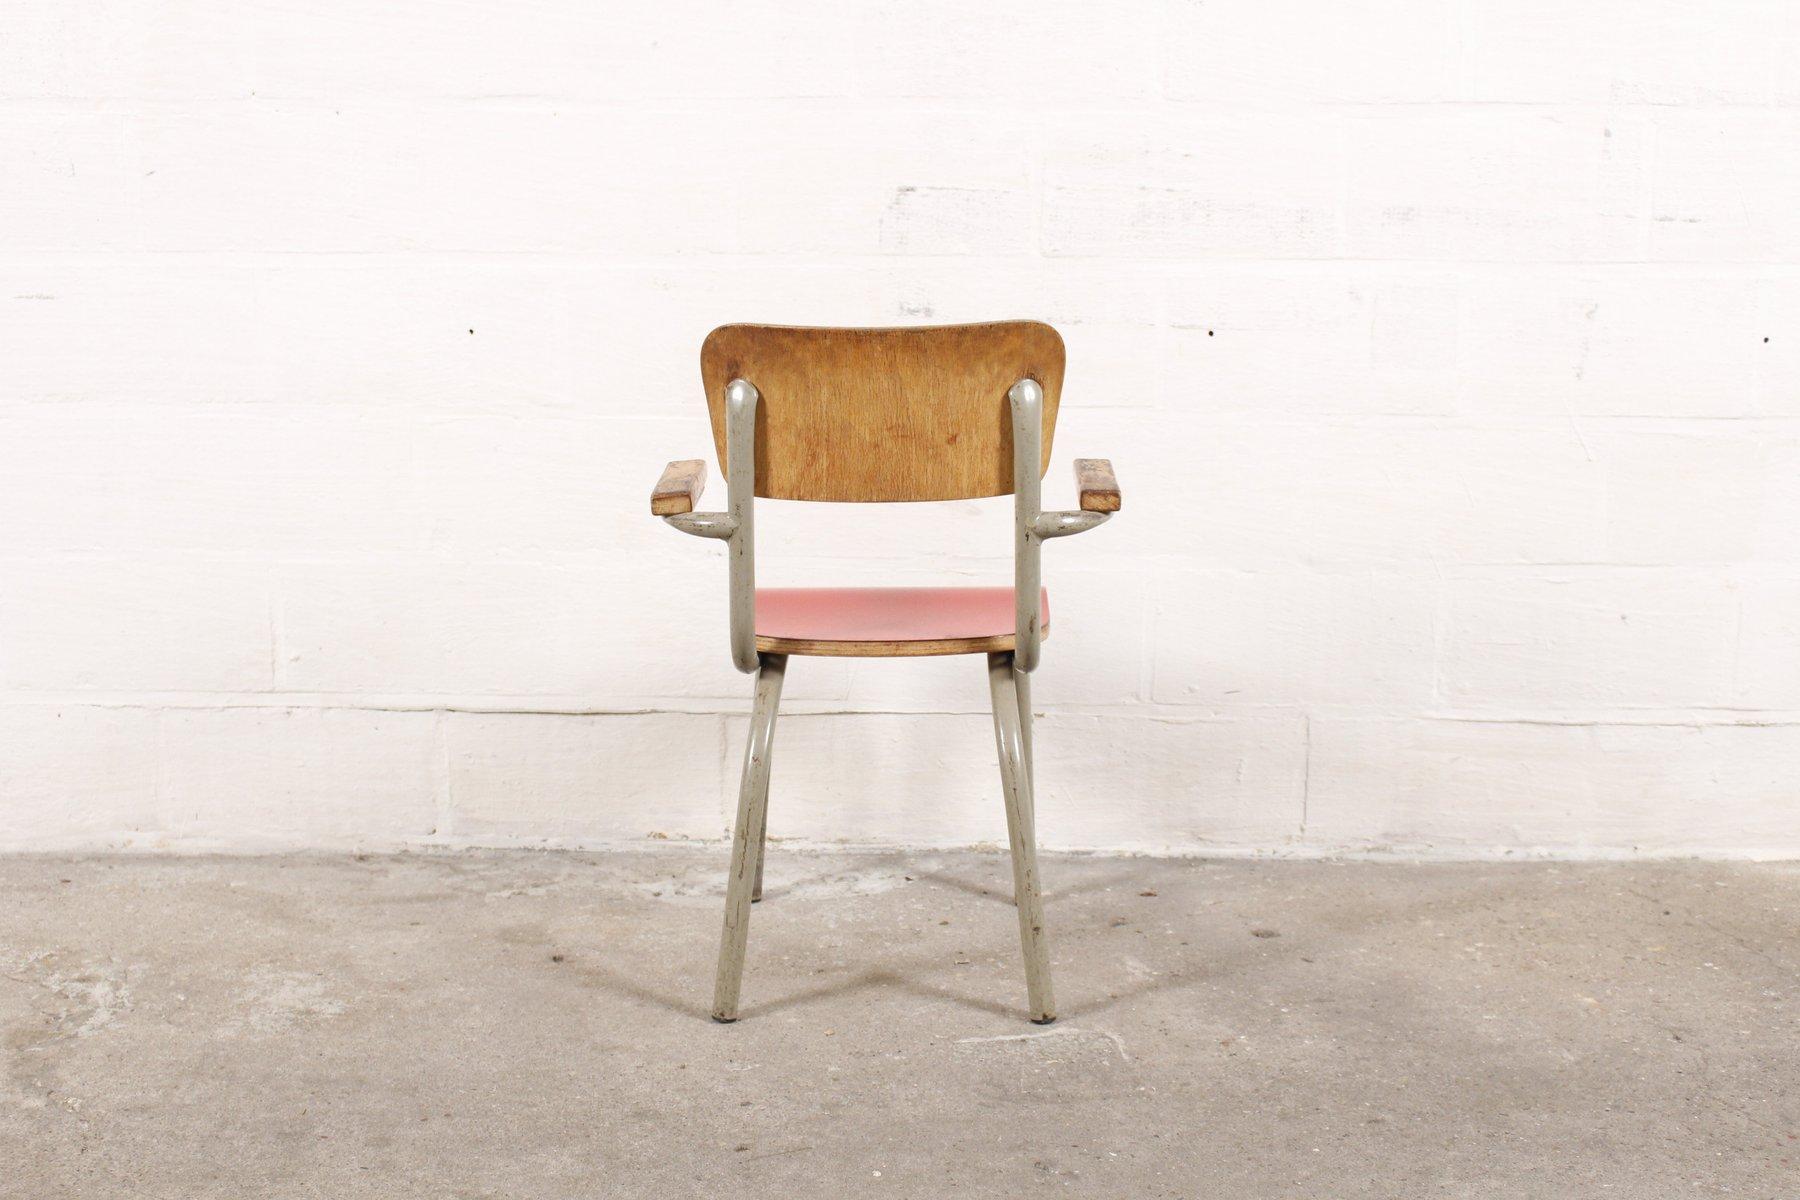 Mid Century Children s Chair by Willy van der Meeren for Tubax for